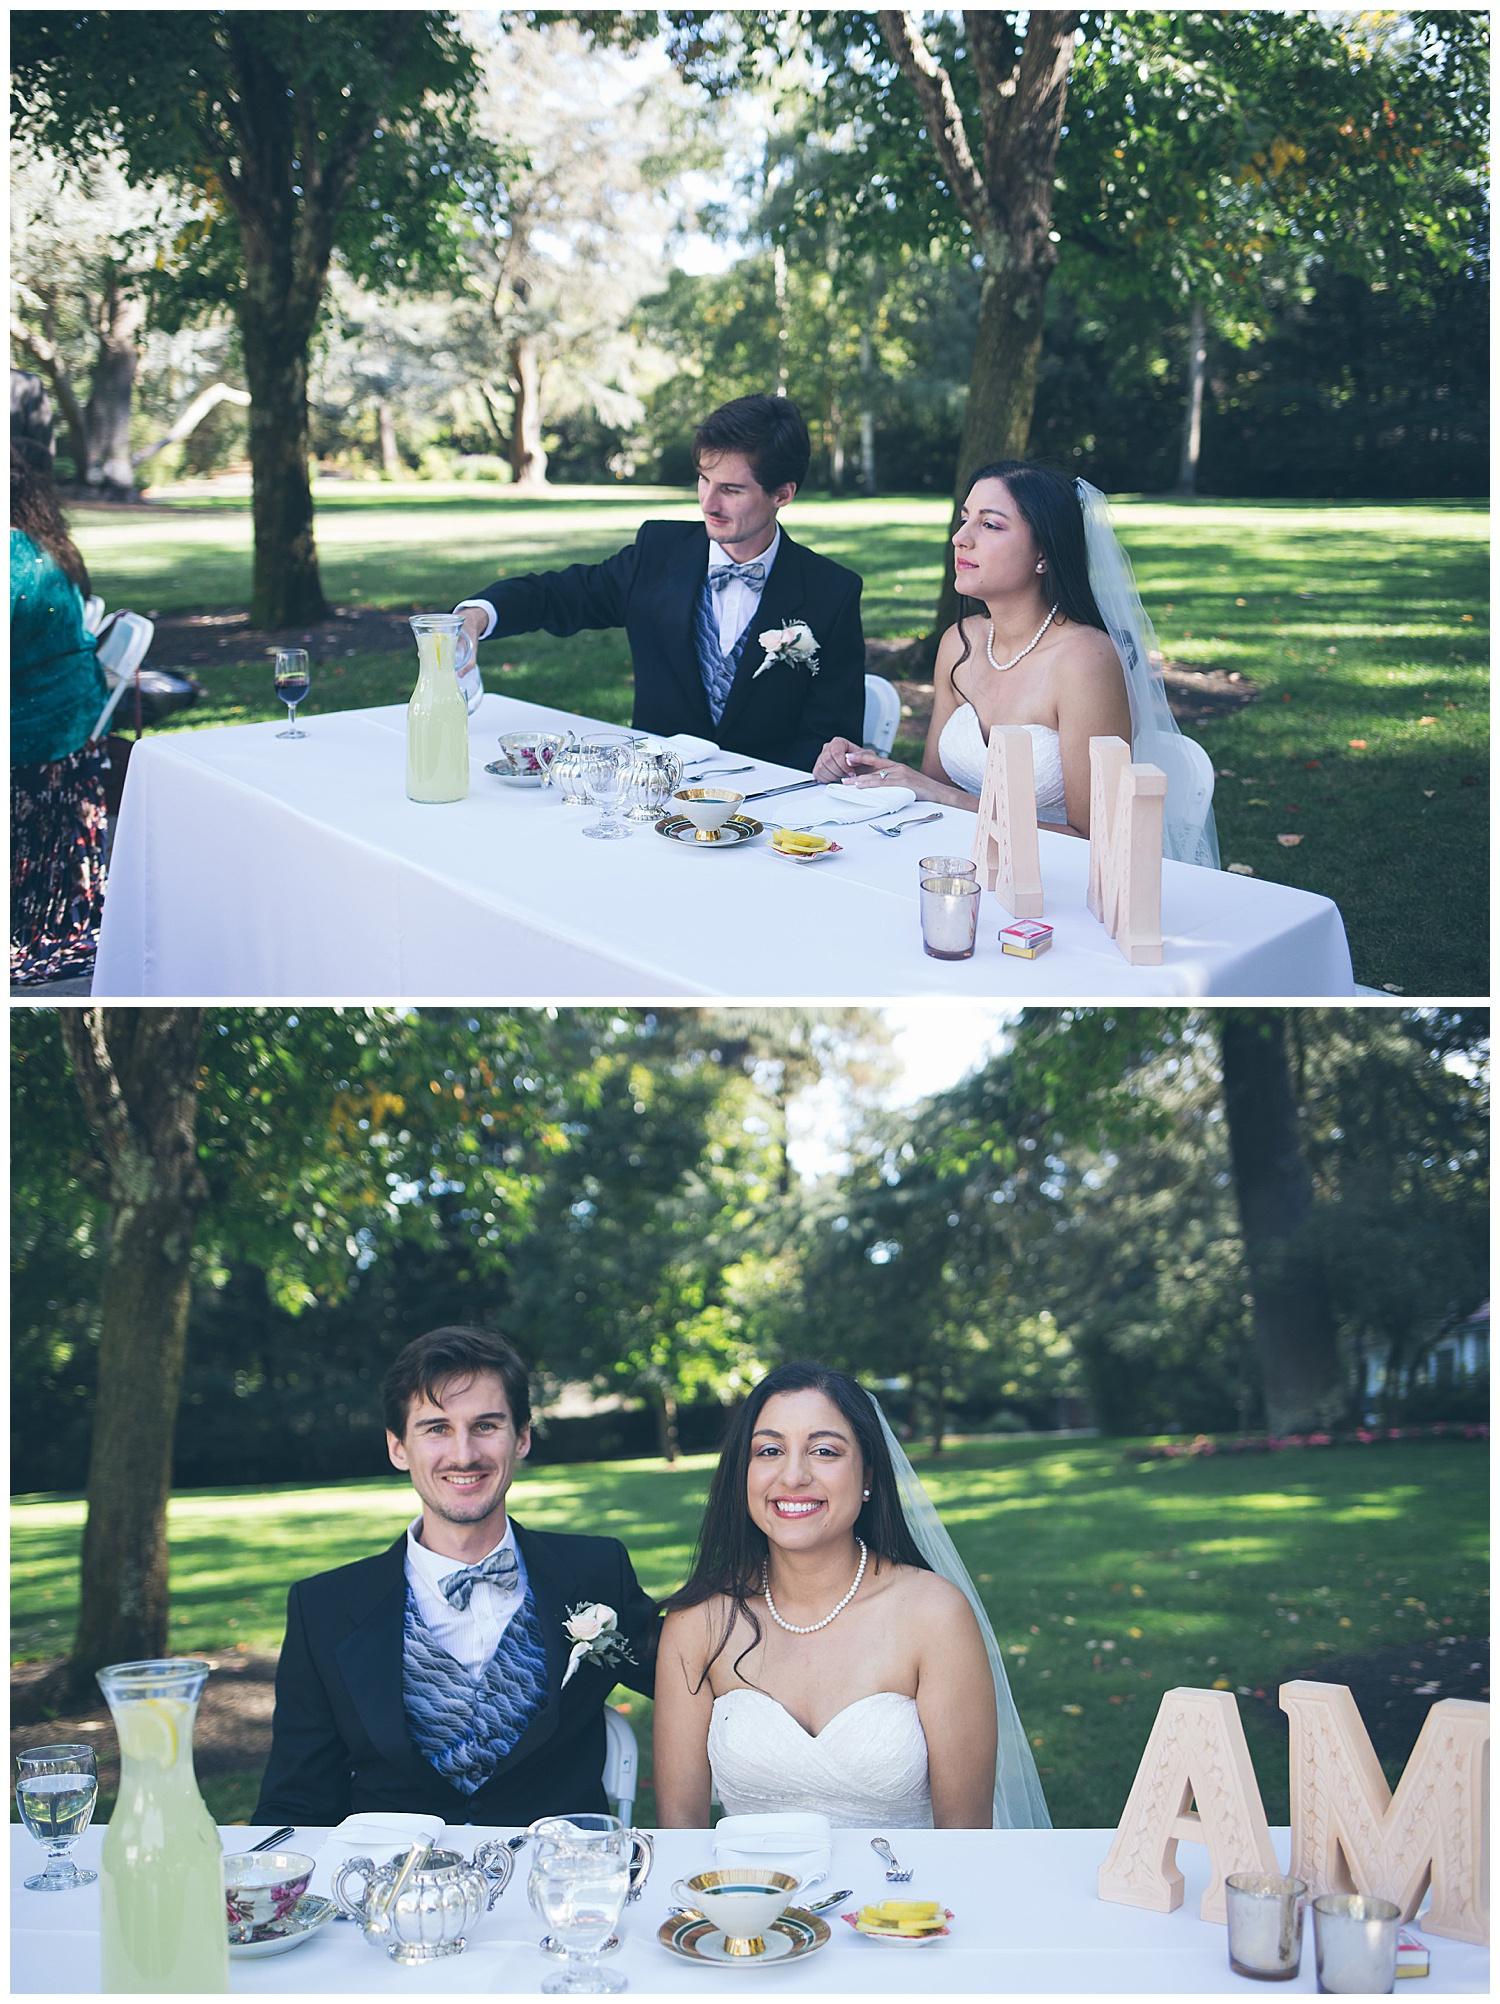 khariza-rae-photography-bay-area-wedding-photographer_0184.jpg